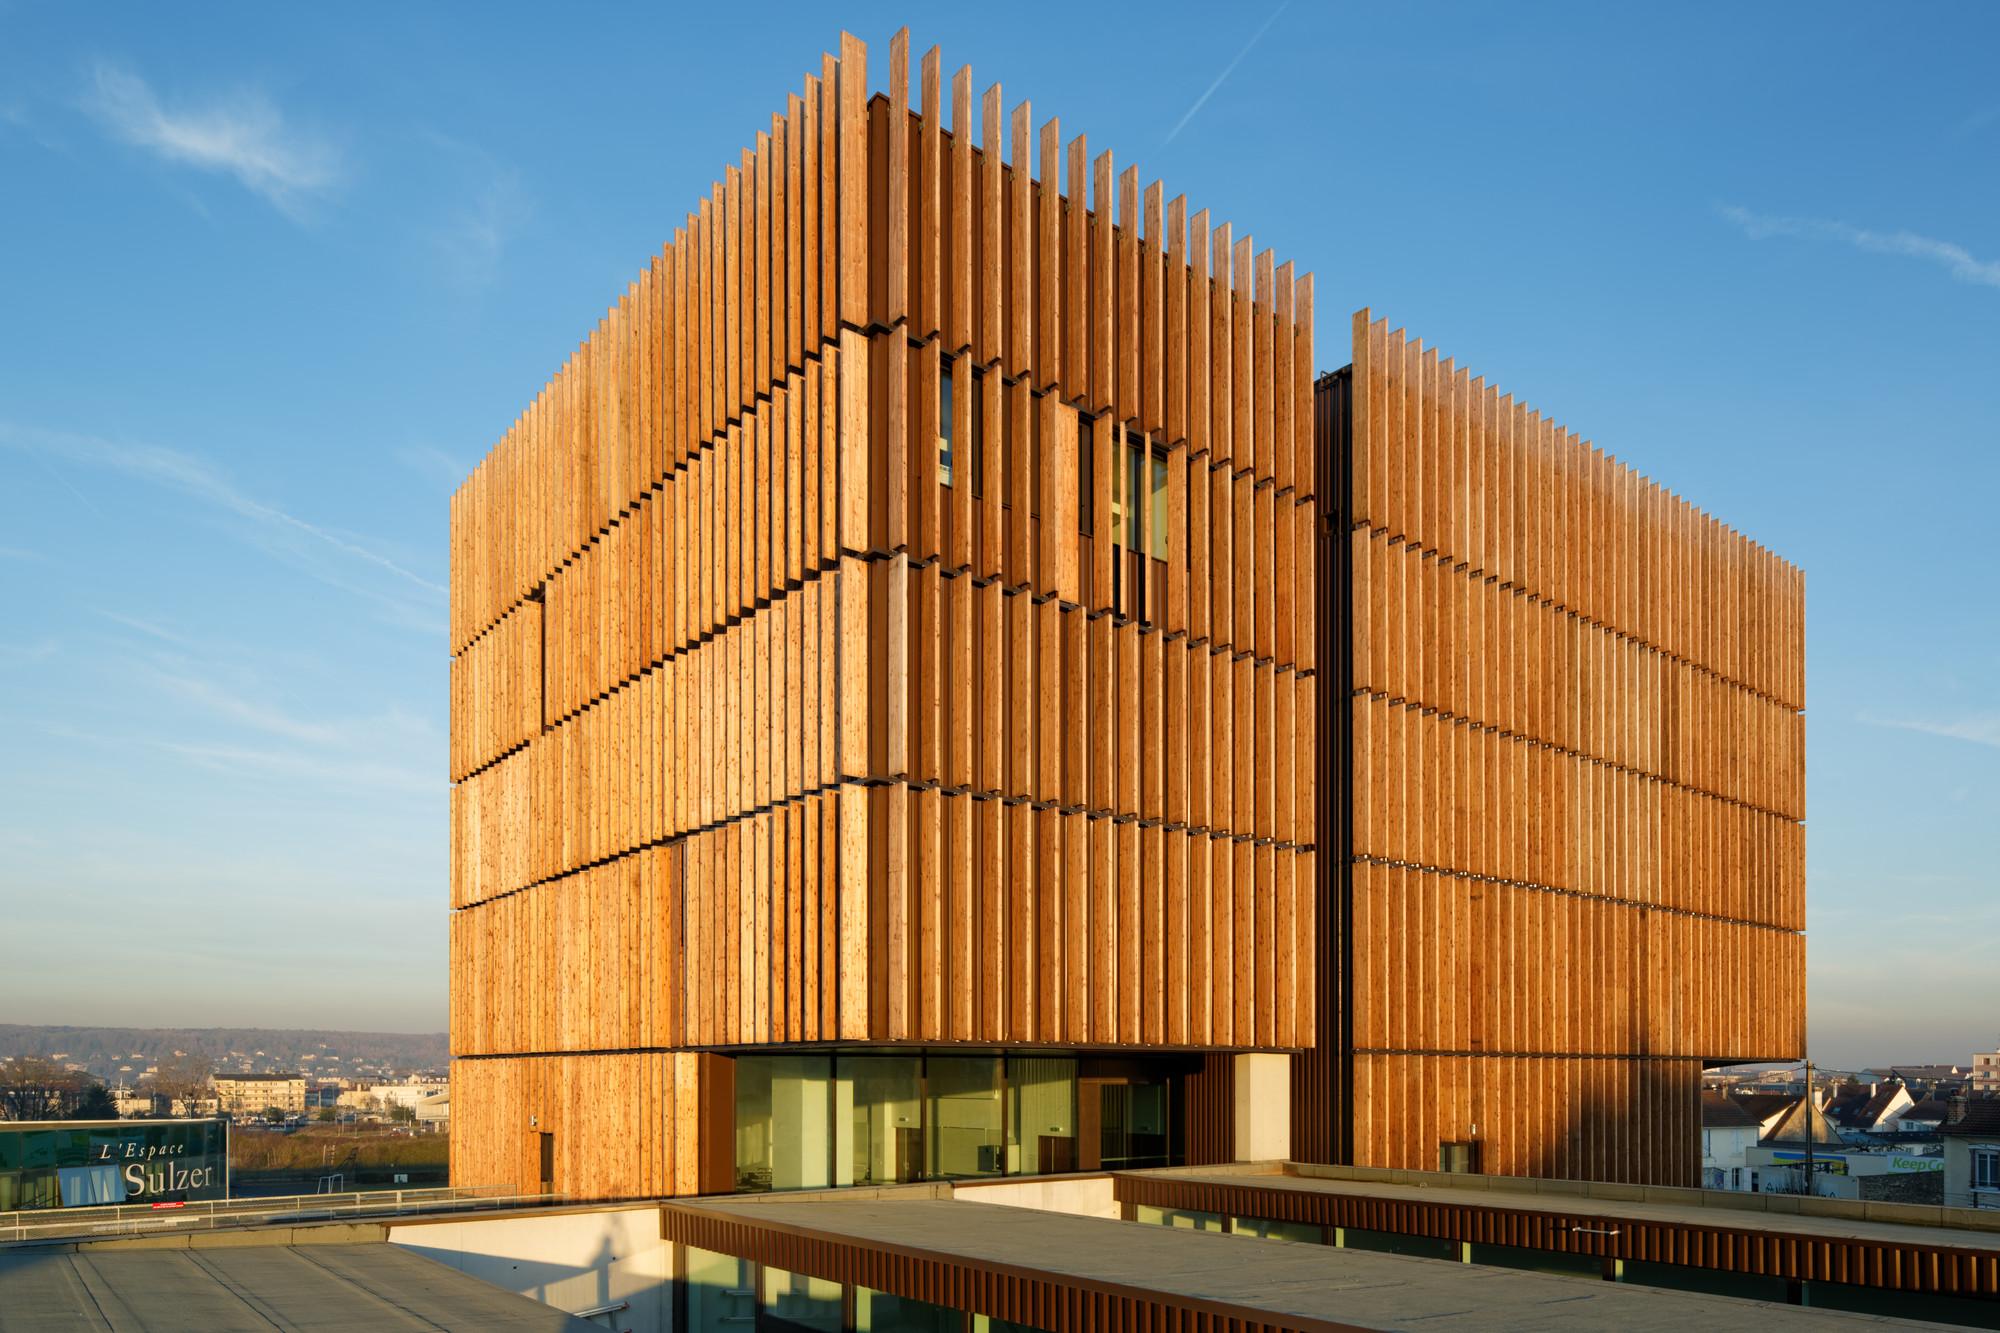 Mantois Technology Centre / Badia Berger Architectes, © Takuji Shimmura